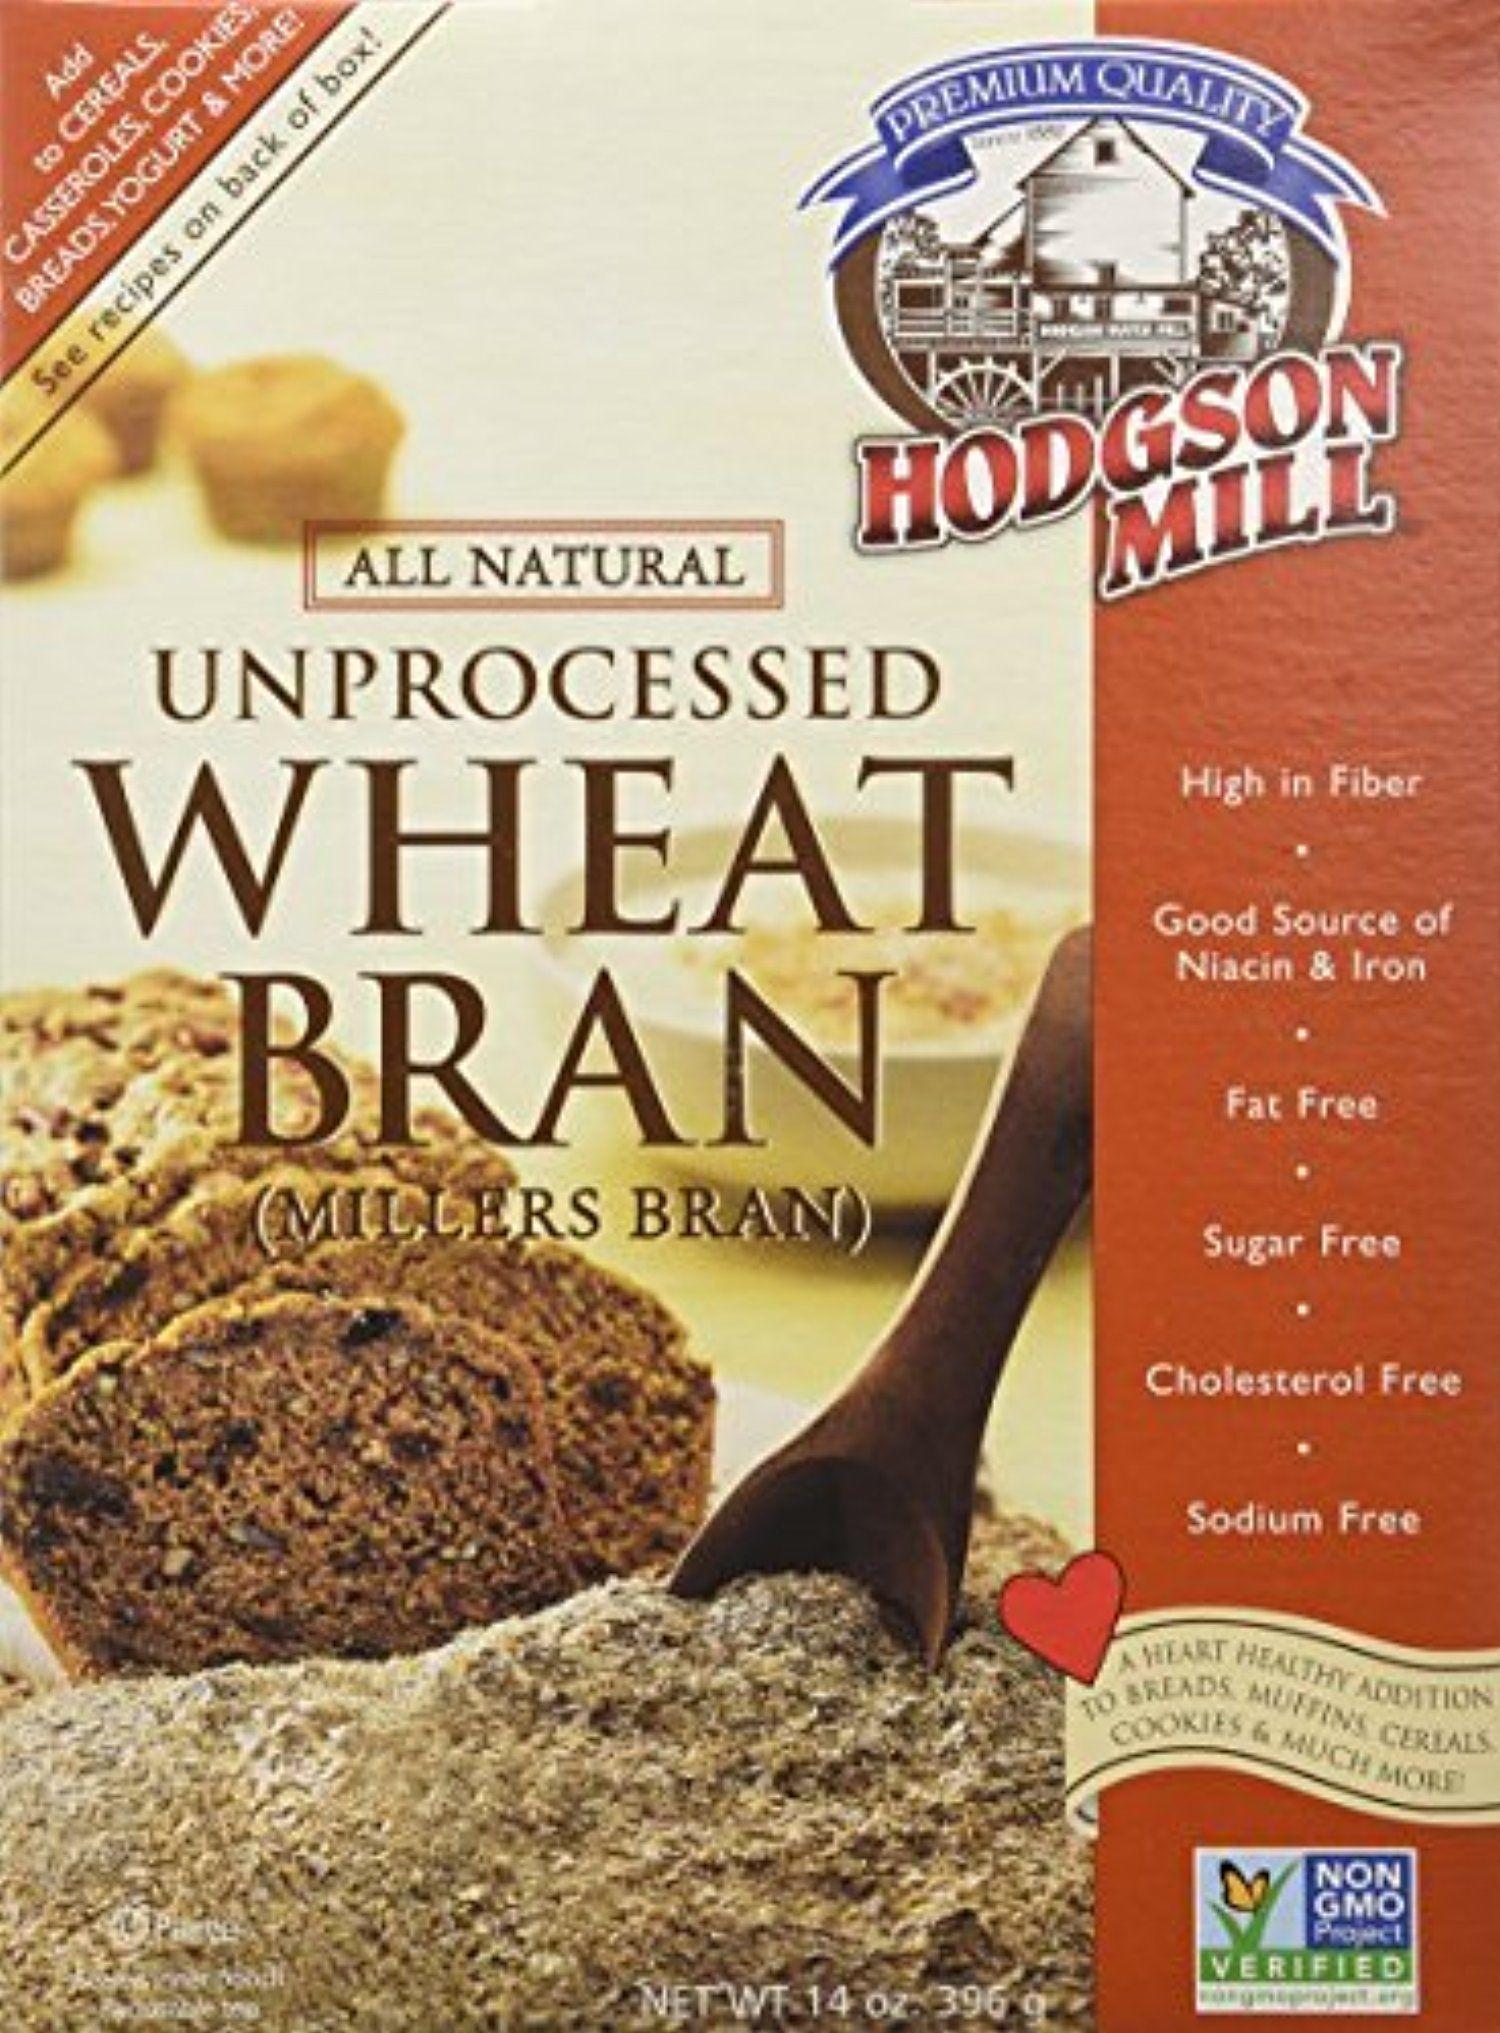 Hodgson Mill Wheat Bran, Unprocessed Millers Bran, 14-Ounce